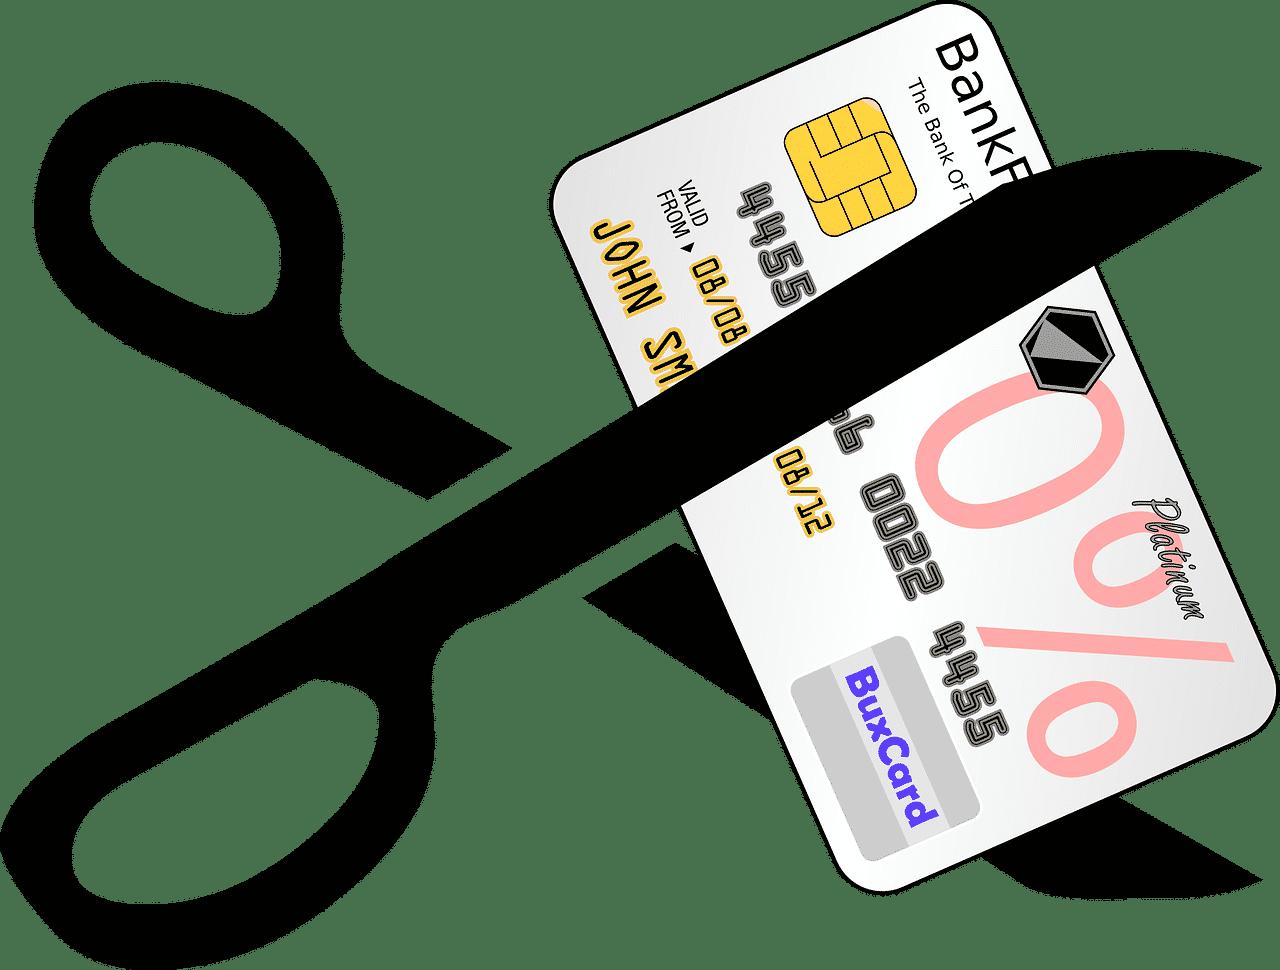 Prepaid-Kreditkarte unsicher